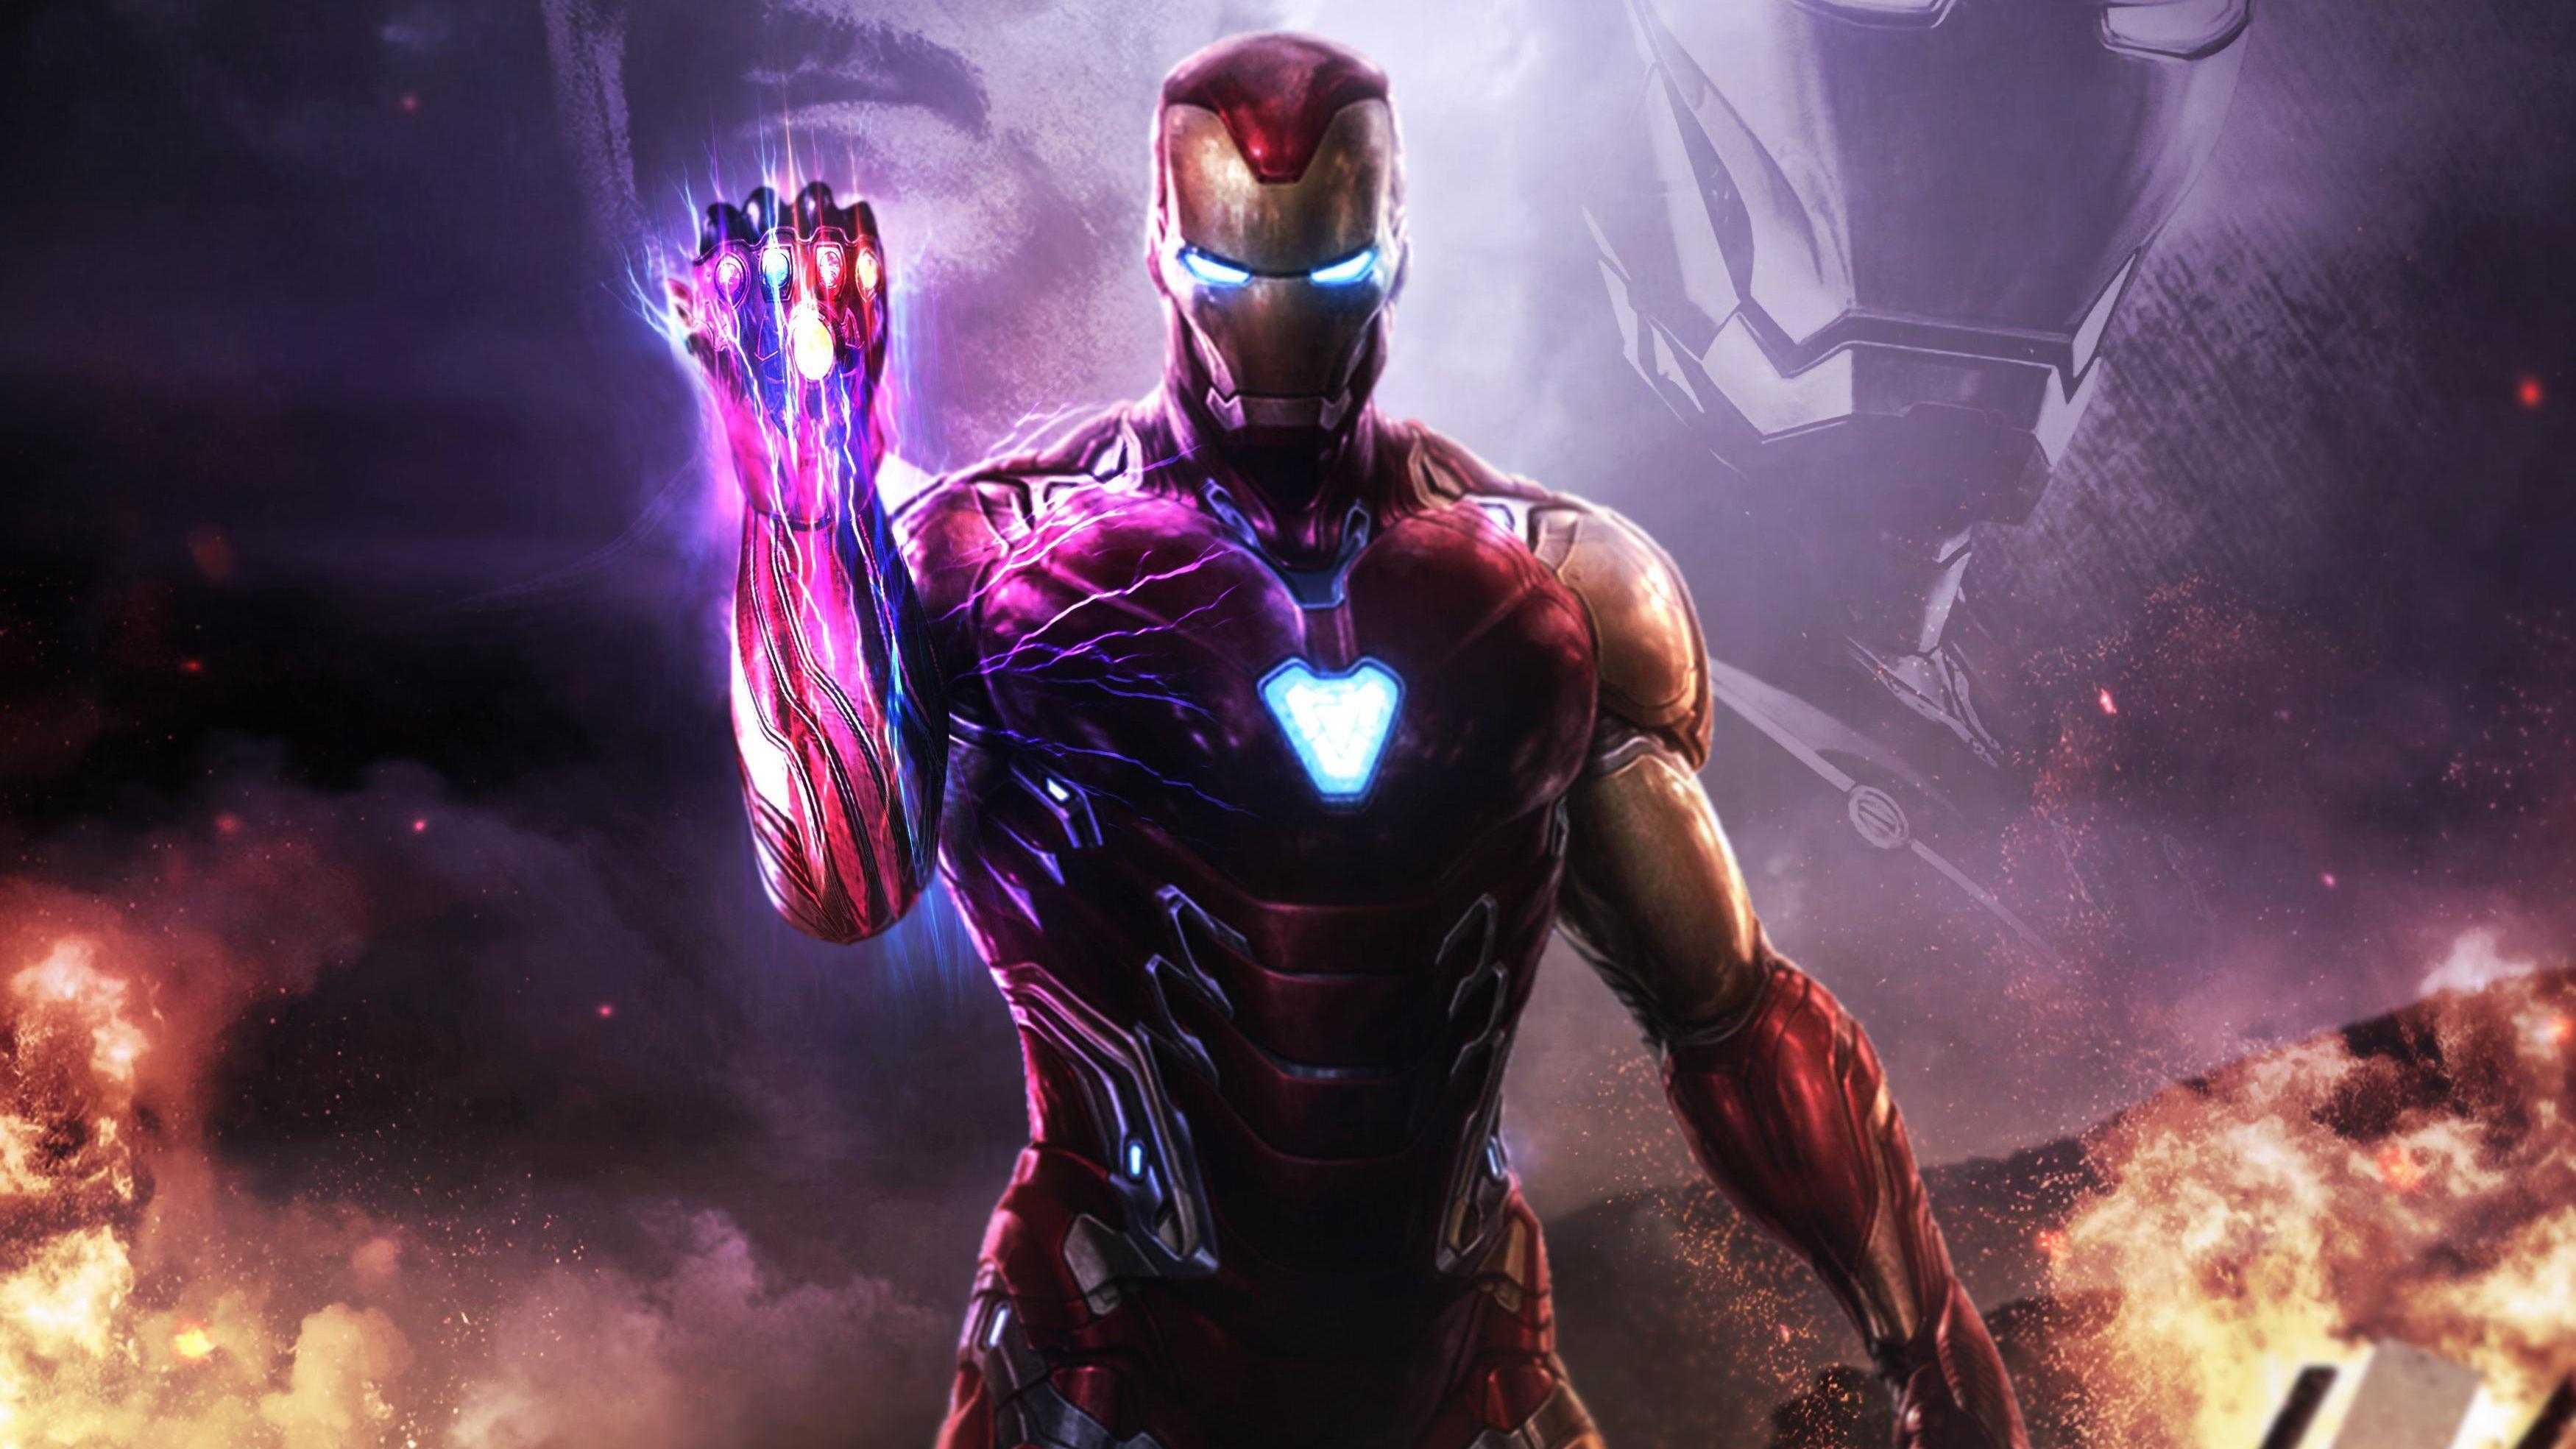 Iron Man Infinity Gauntlet Wallpapers Top Free Iron Man Infinity